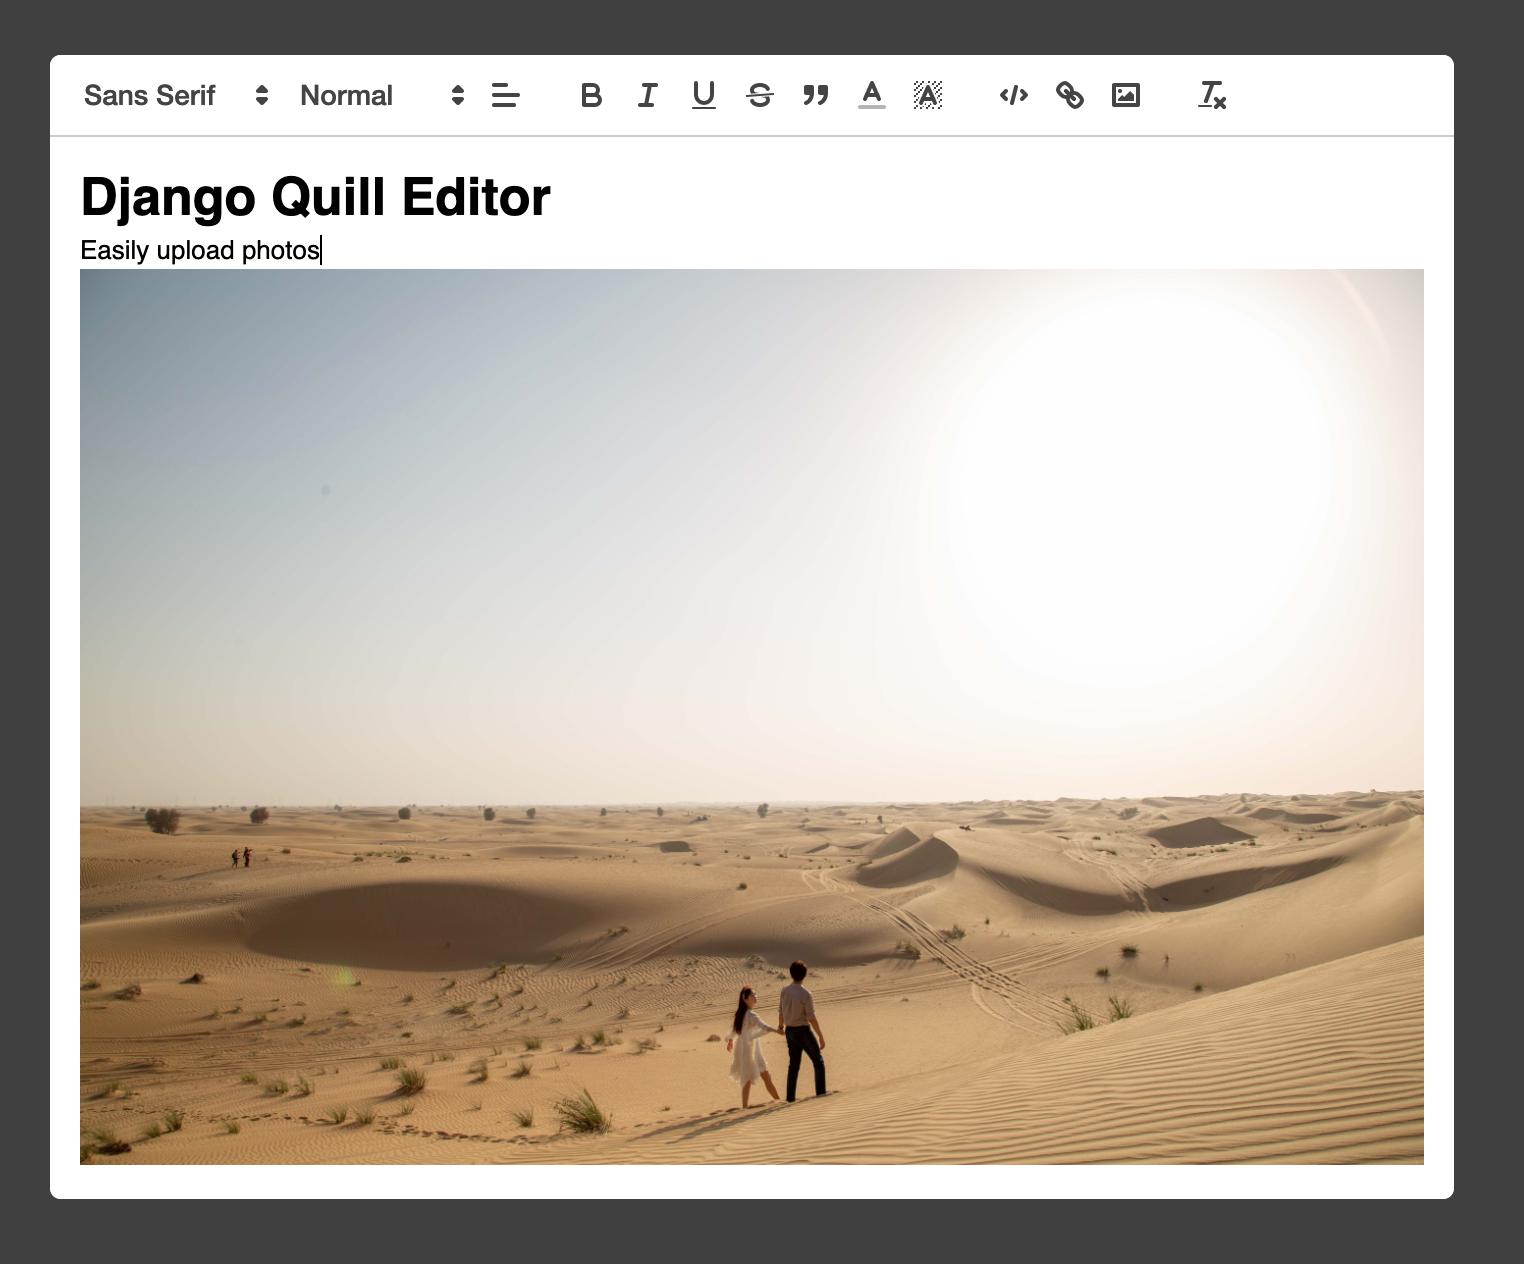 django-quill-editor